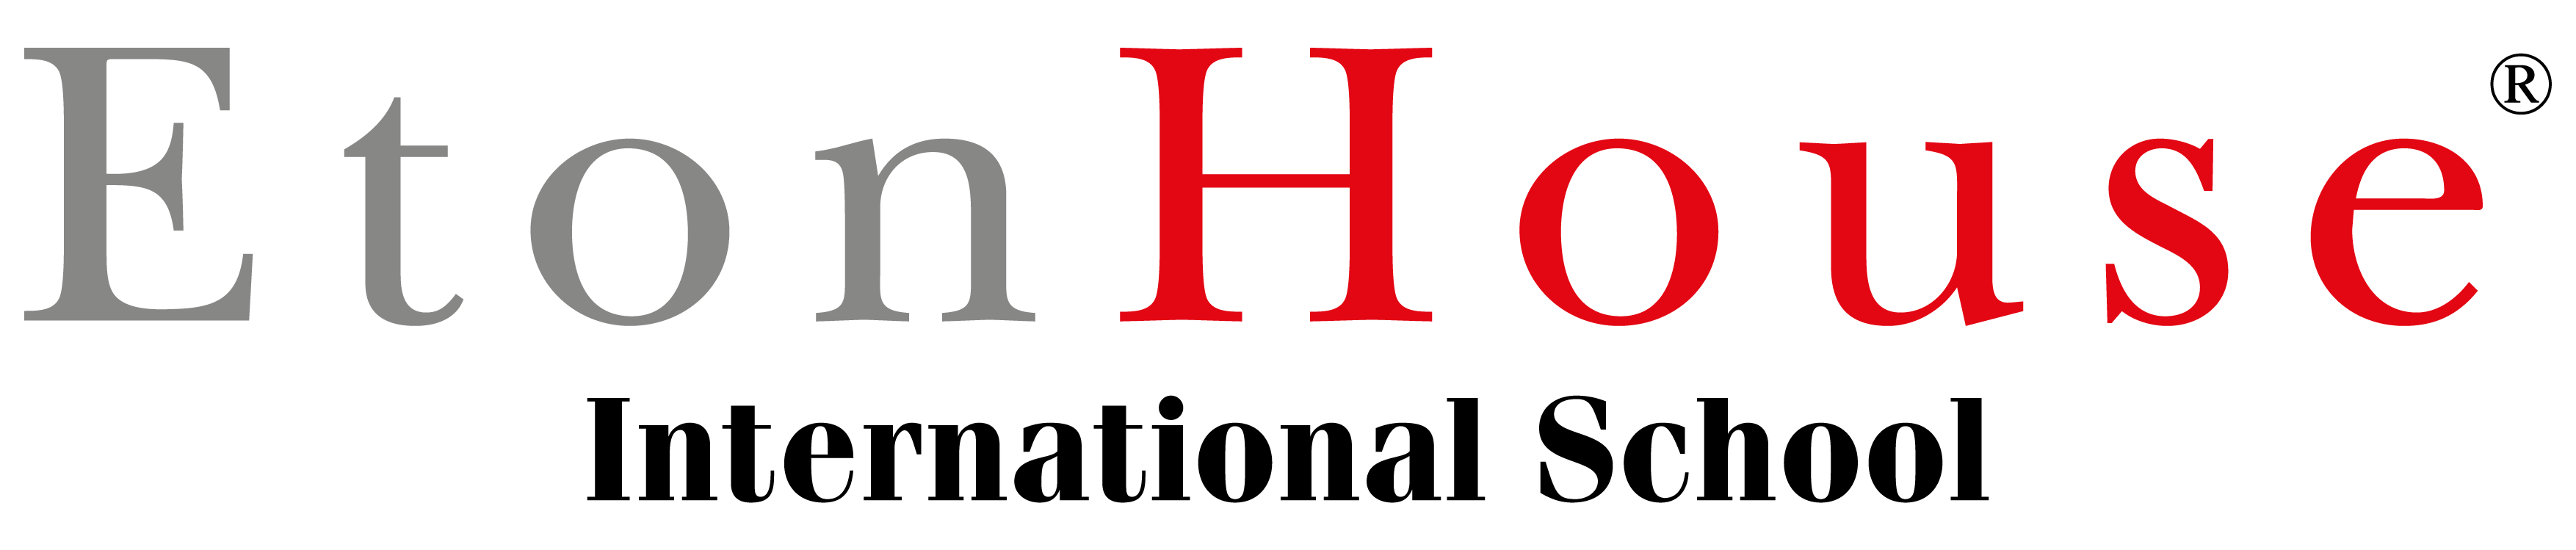 EH Interantional School logo-01-2